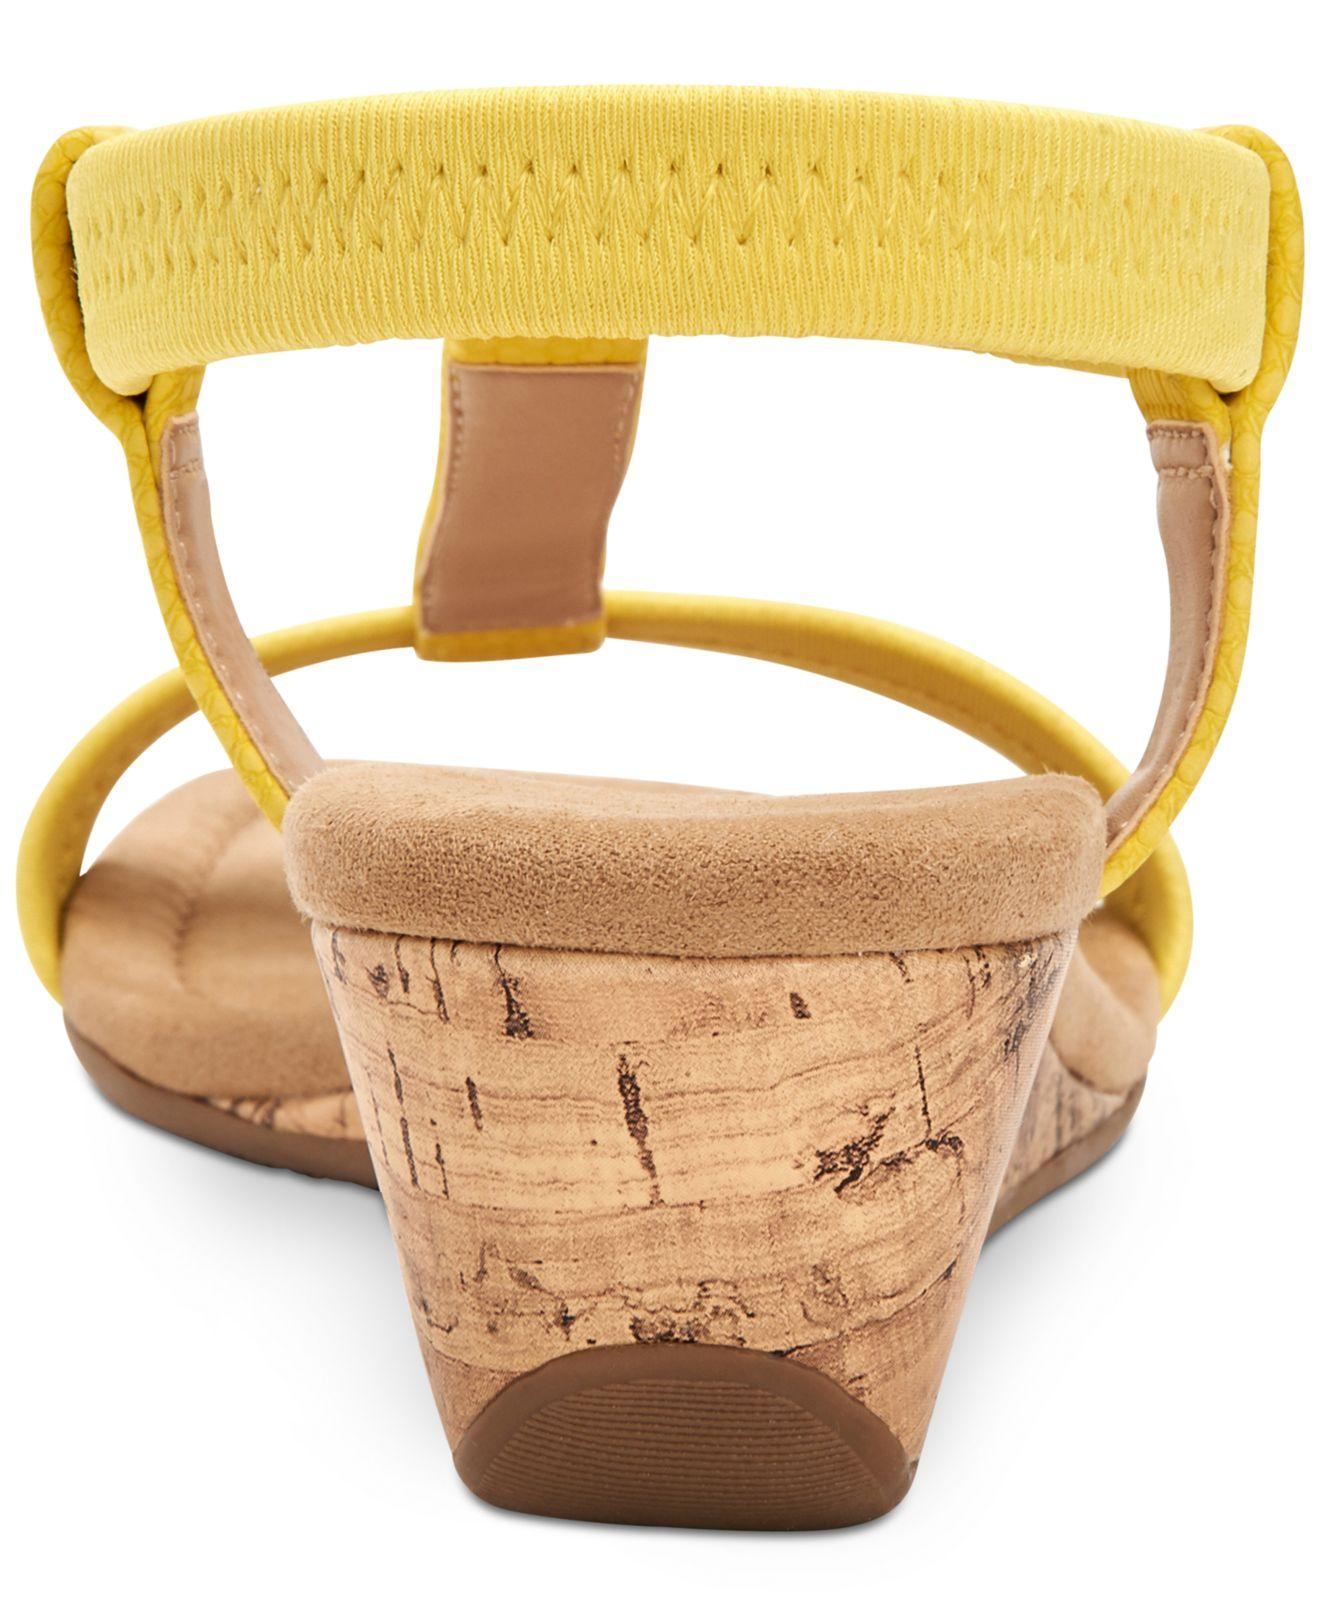 3a8c42b4e4b0 Alfani - Yellow Step  n Flex Voyage Wedge Sandals